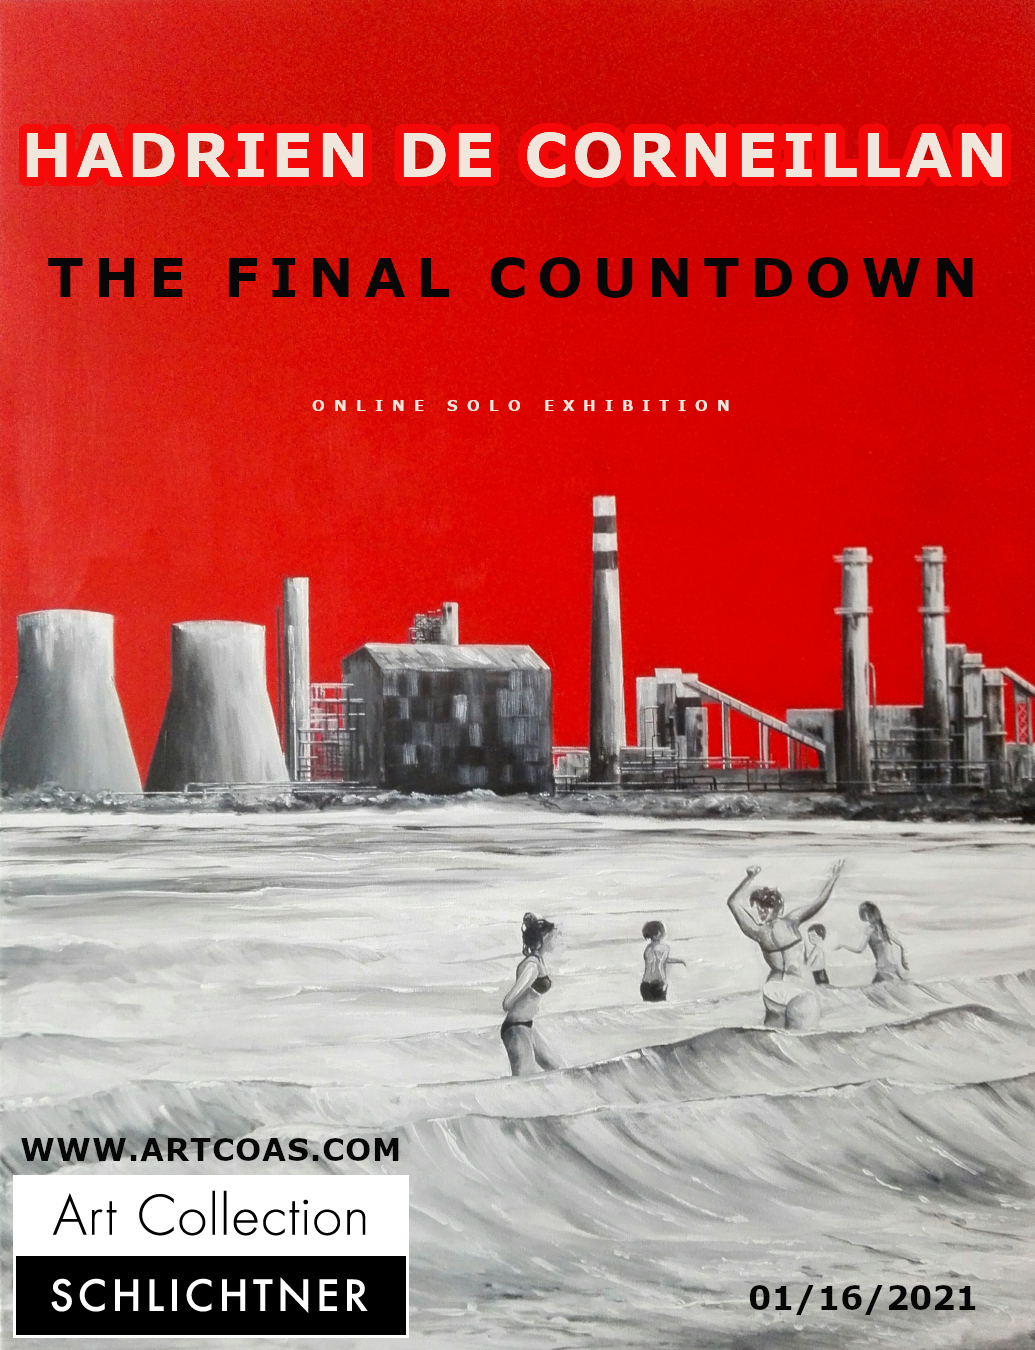 Hadrien de Corneillan - The Final Countdown – online solo exhibition